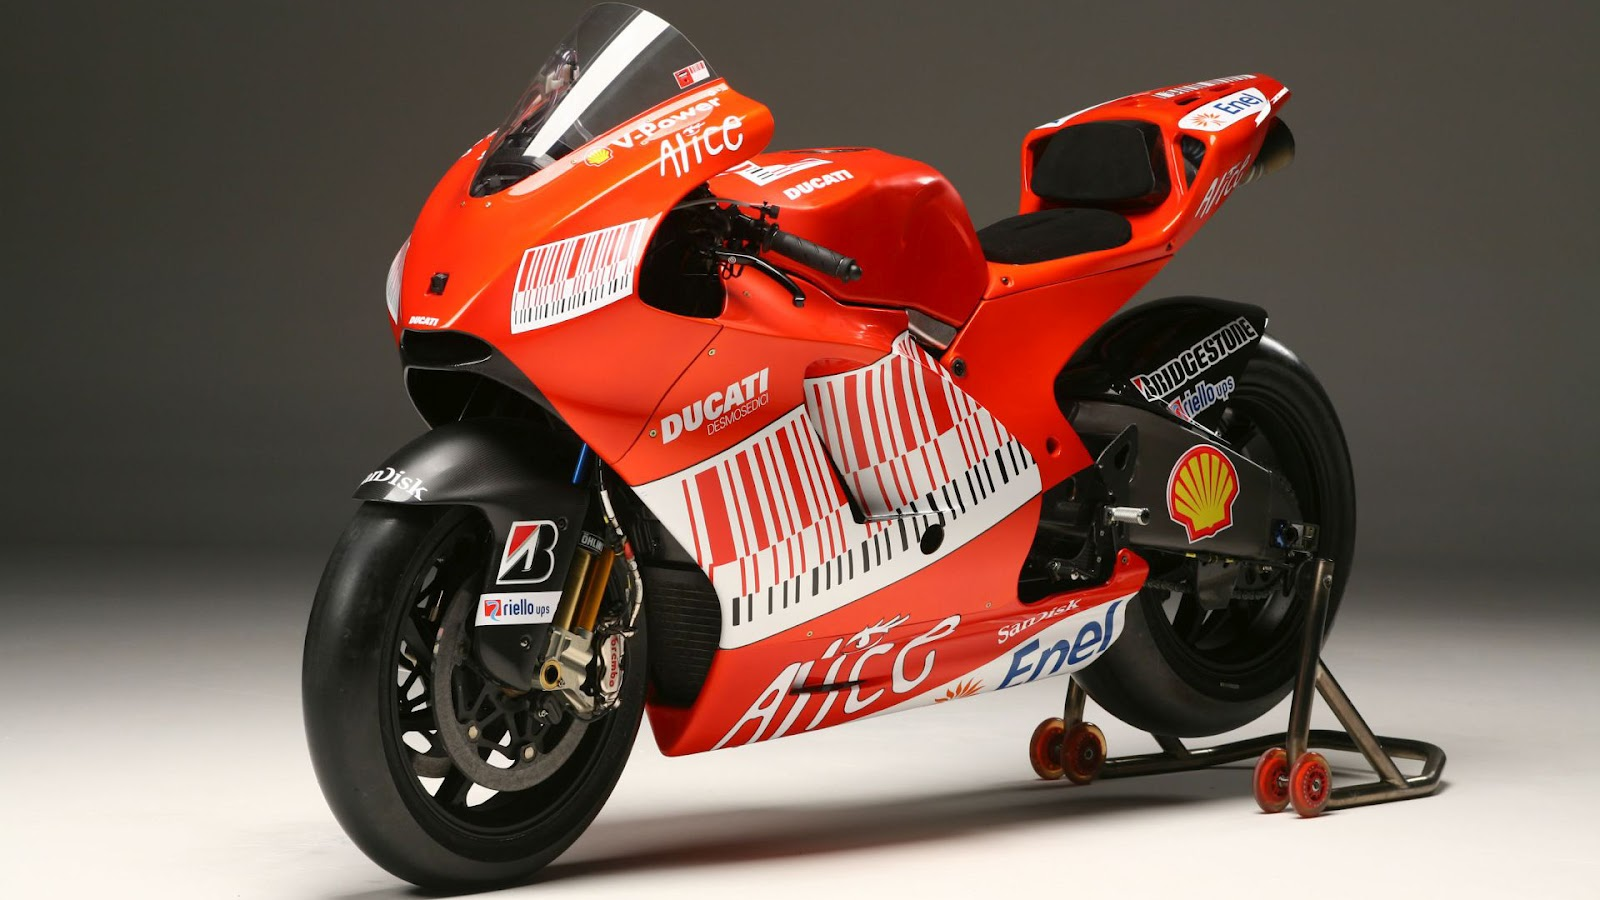 http://3.bp.blogspot.com/-MDCX4KSOJBA/T-lx-J-9k1I/AAAAAAAABmY/_v5z-axp0n4/s1600/ducati_sports_bike-HD.jpg